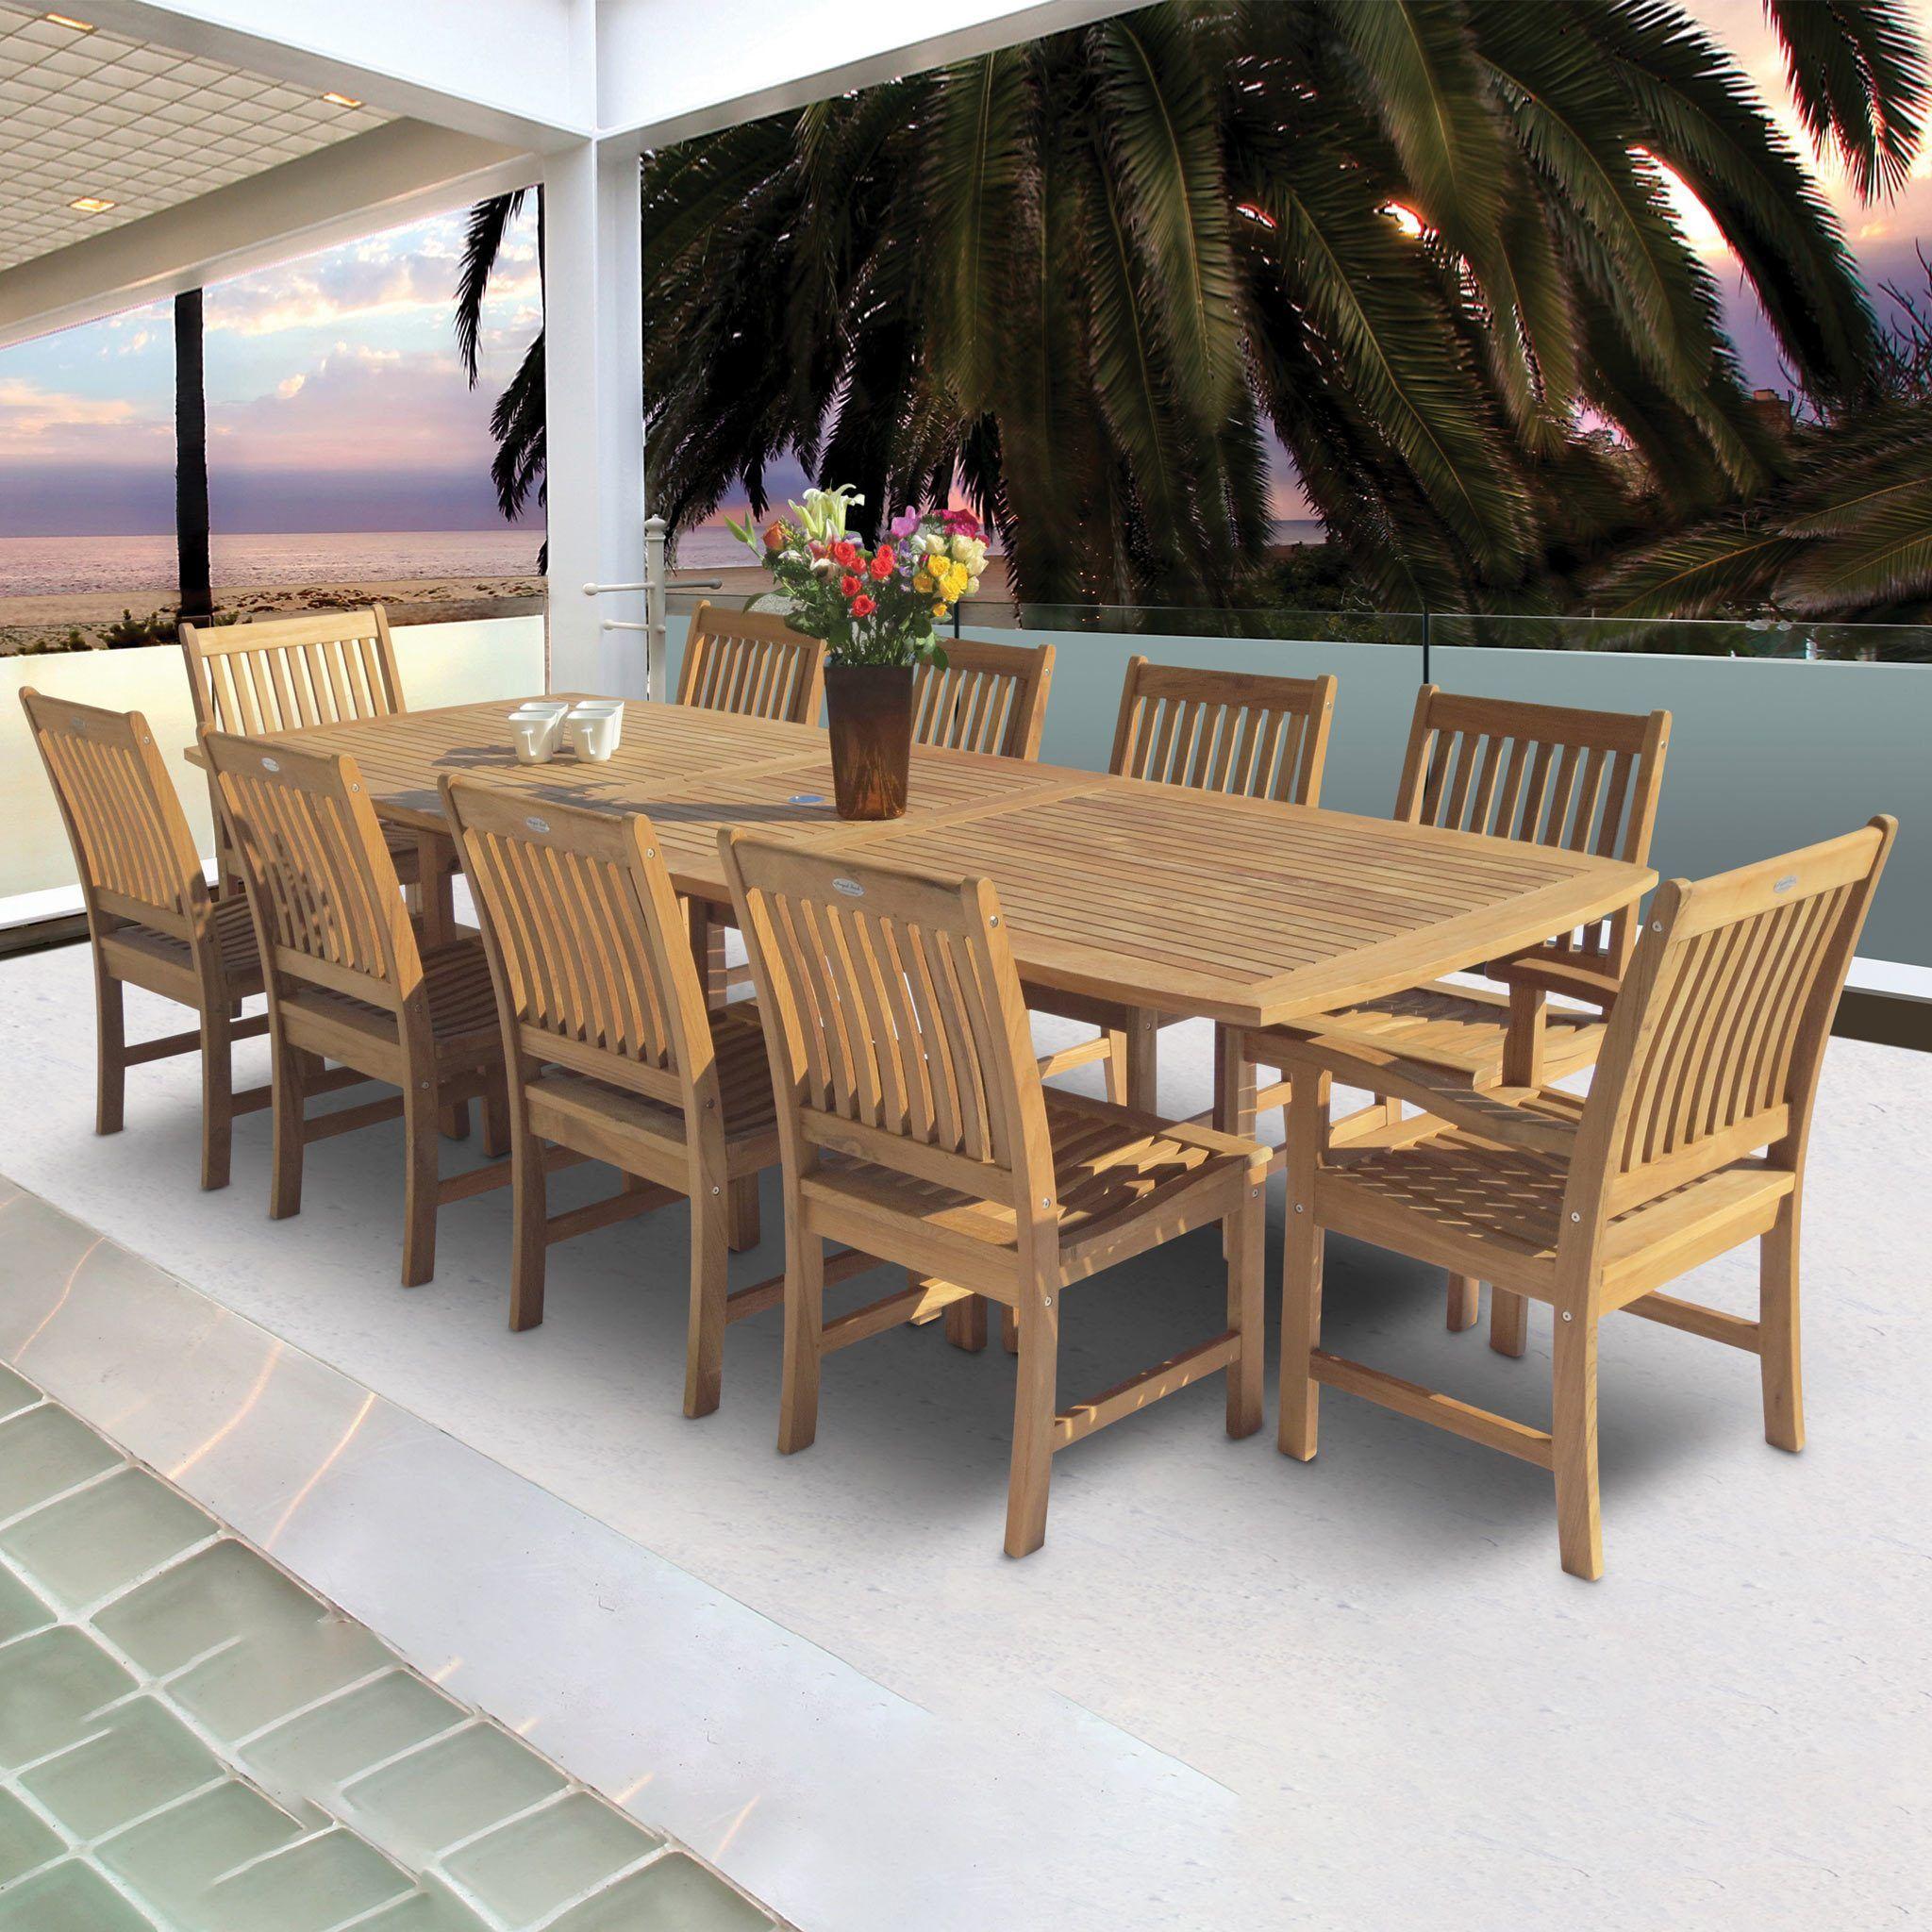 96 120 Rectangular Family Expansion Teak Table Patio Dining Set Patio Patio Decor